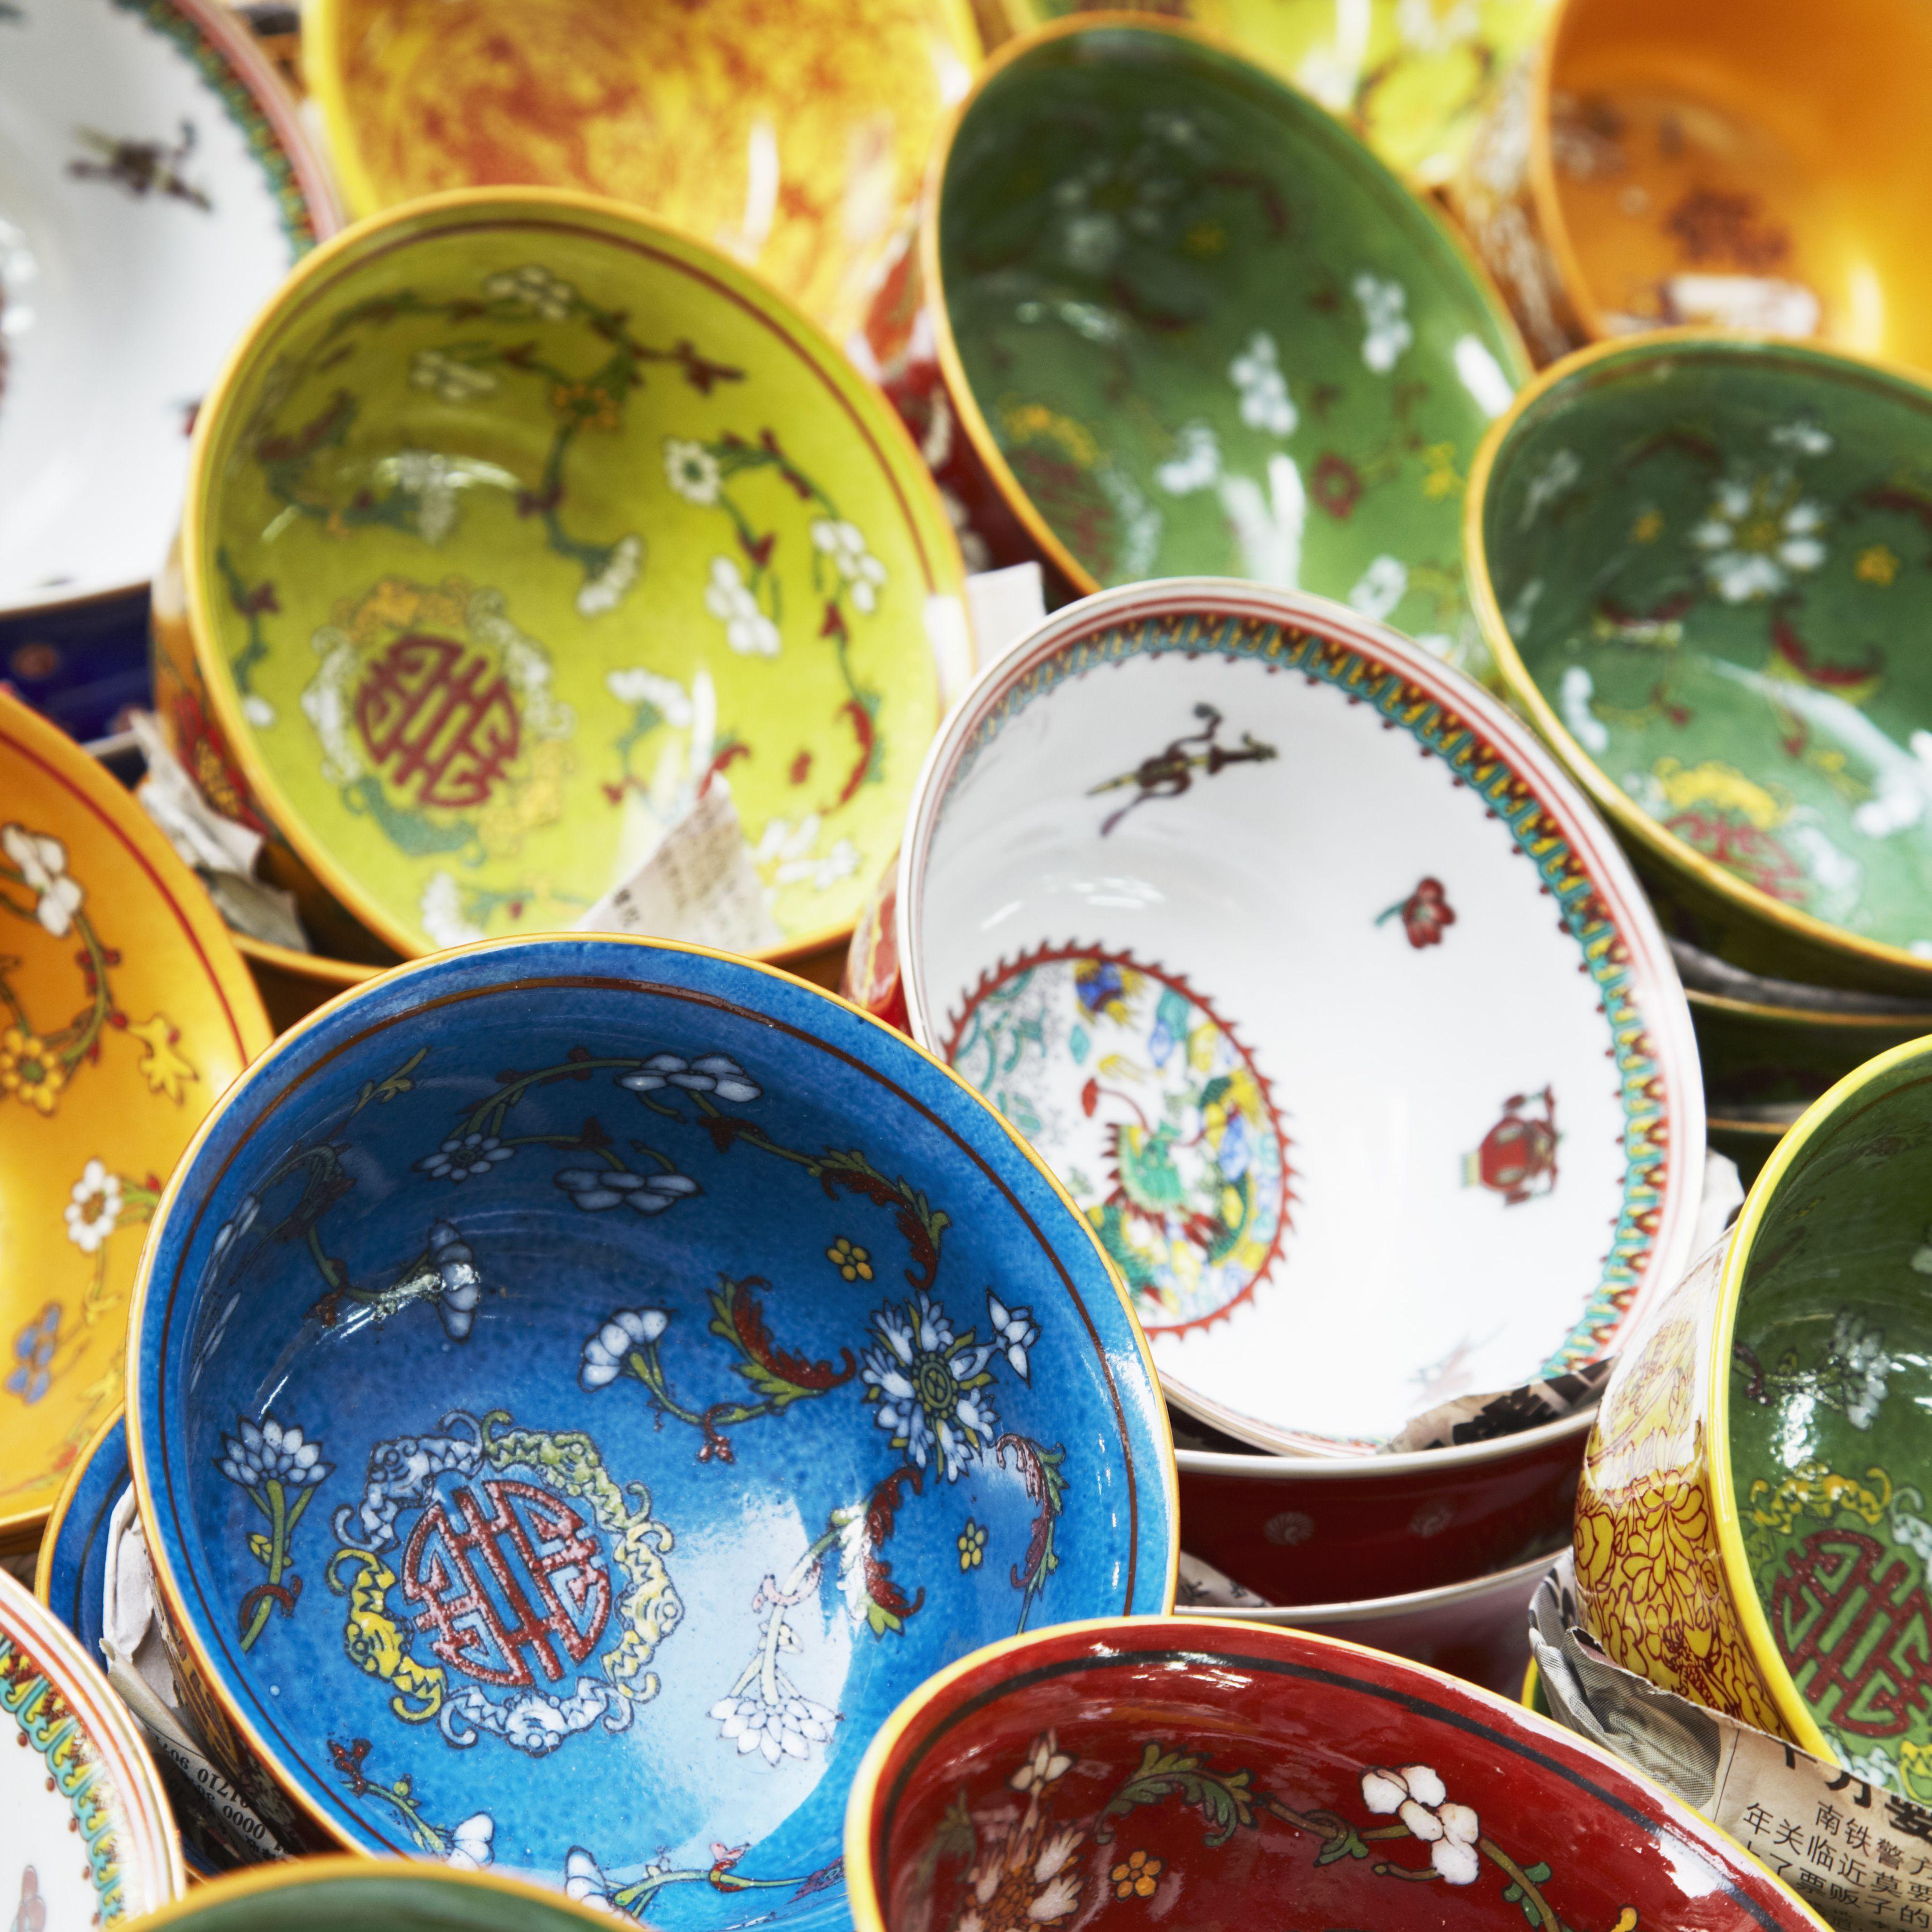 China, Hong Kong, Colorful Chinese bowls on market stall on Upper Lascar Row (Cat Street)